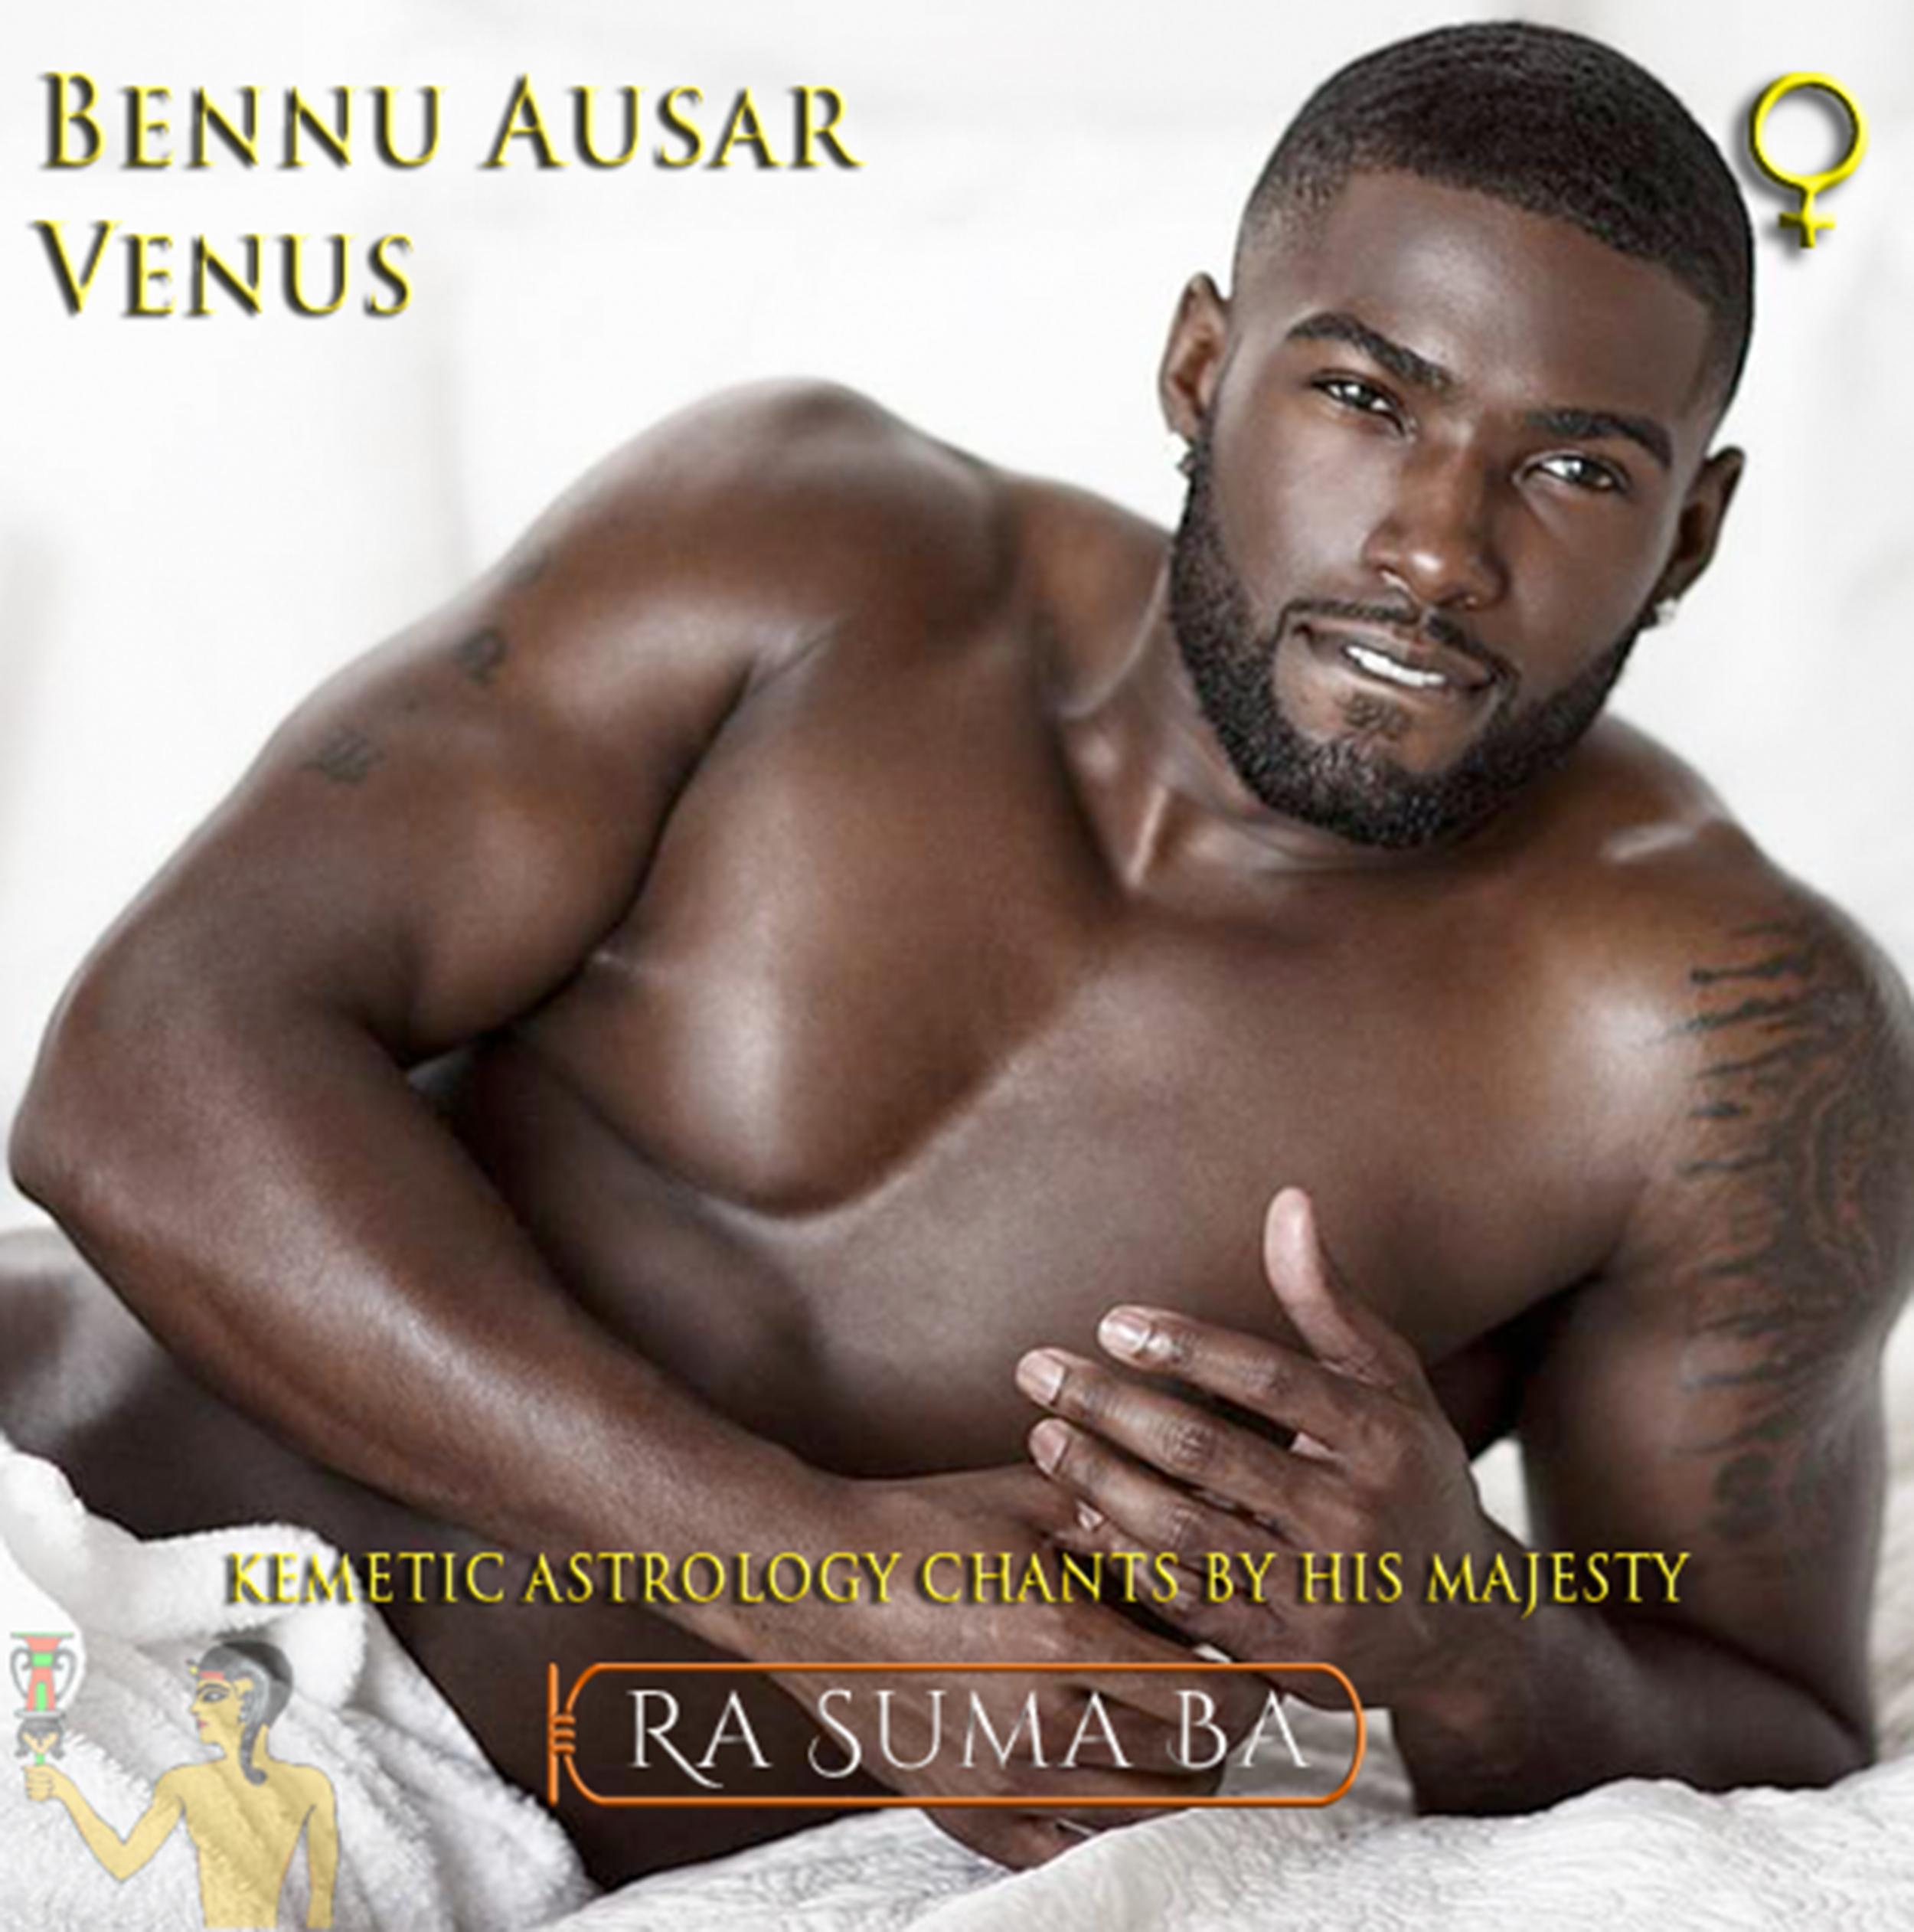 Bennu Ausar (Venus) - Kemetic Astrology Chants